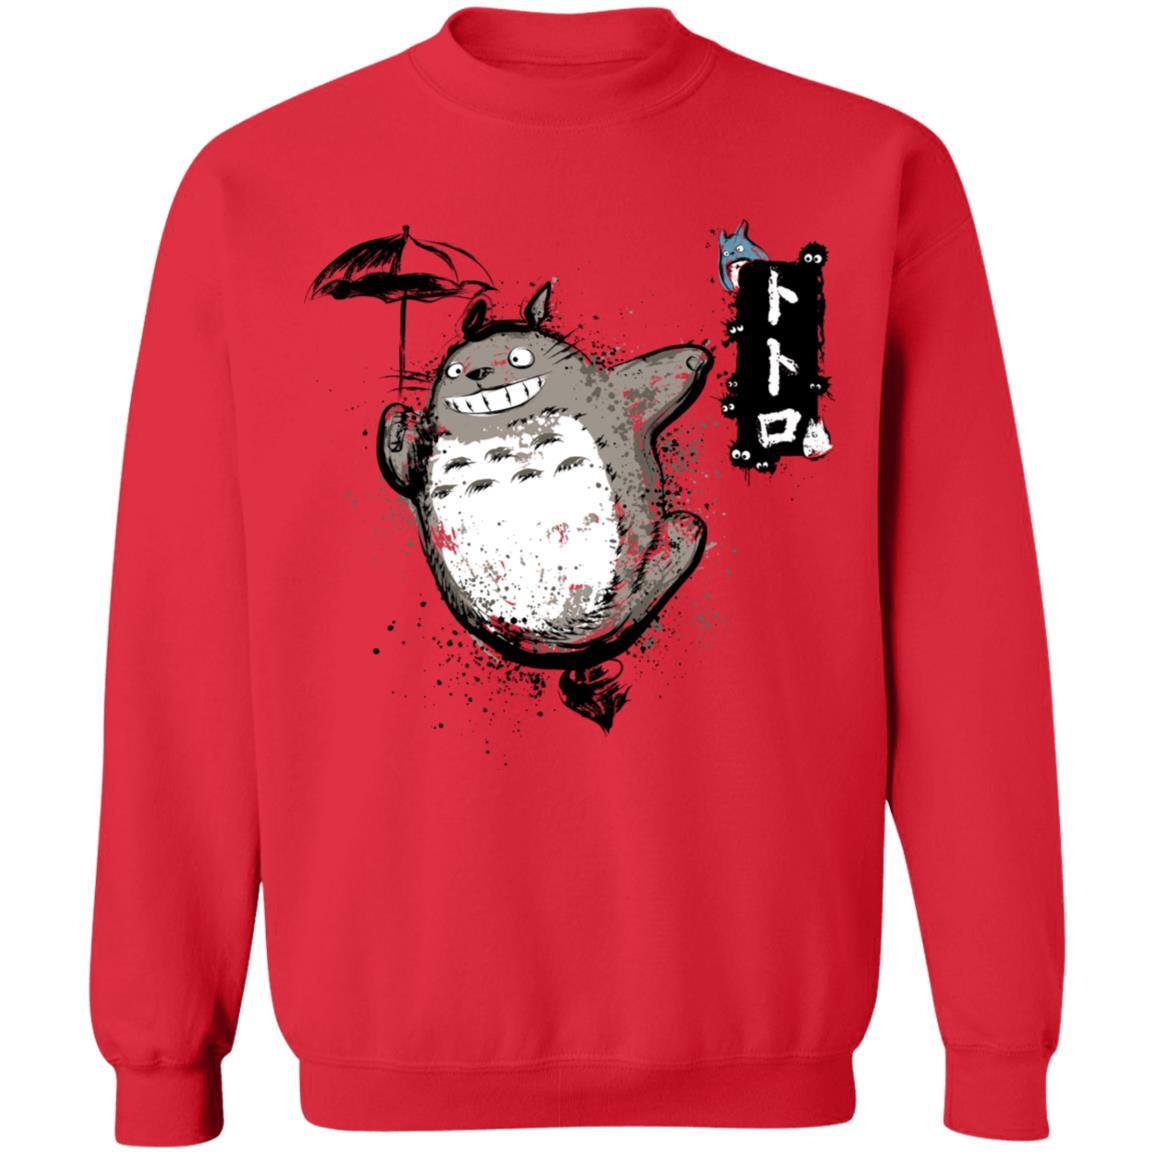 Spinning Totoro Sweatshirt